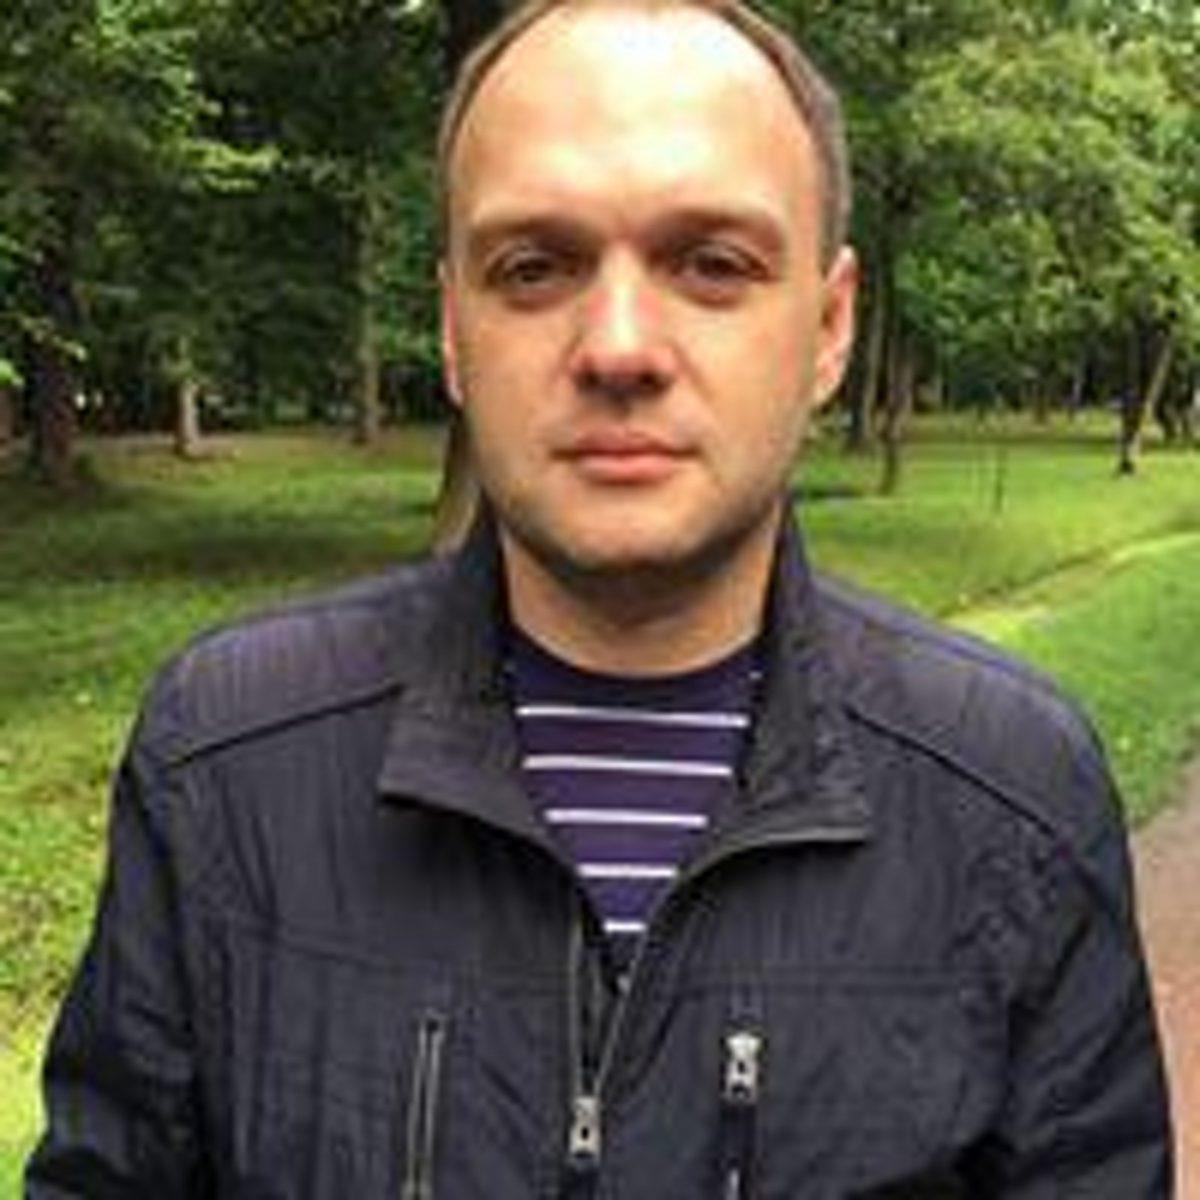 Alexandr Sharapov